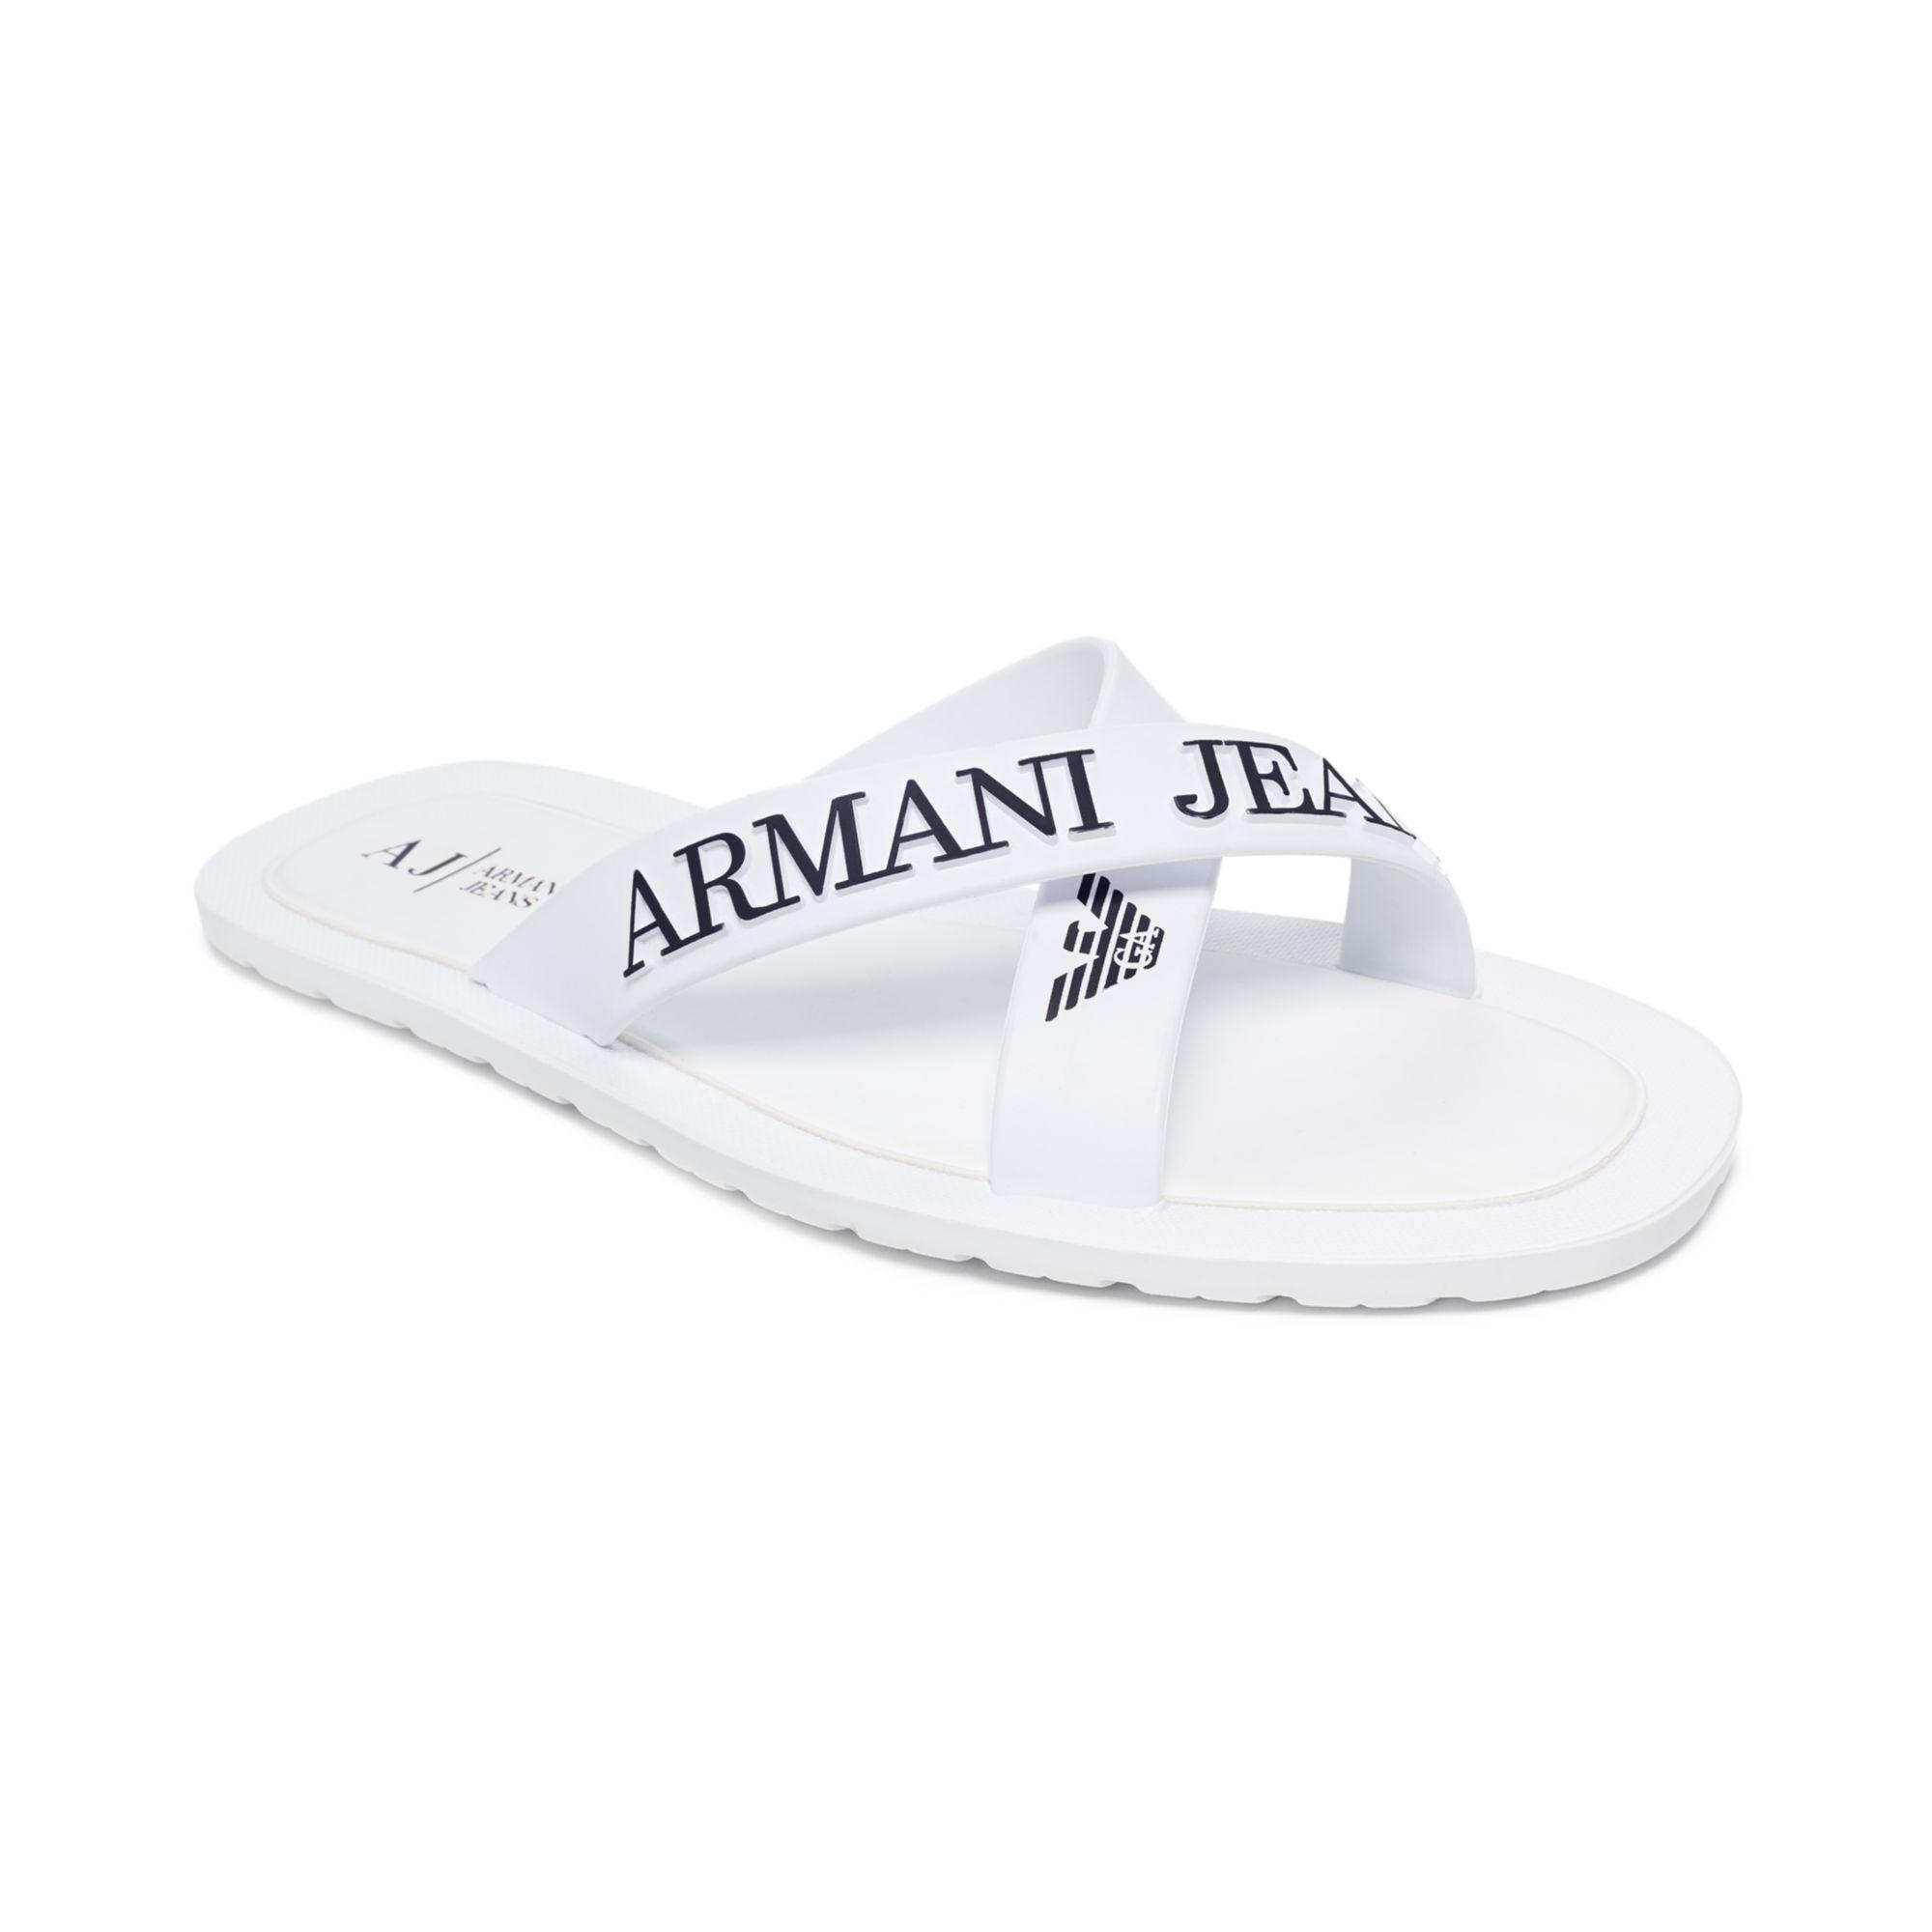 ba8715de6a31 Armani Jeans Logo Sandals in White for Men - Lyst